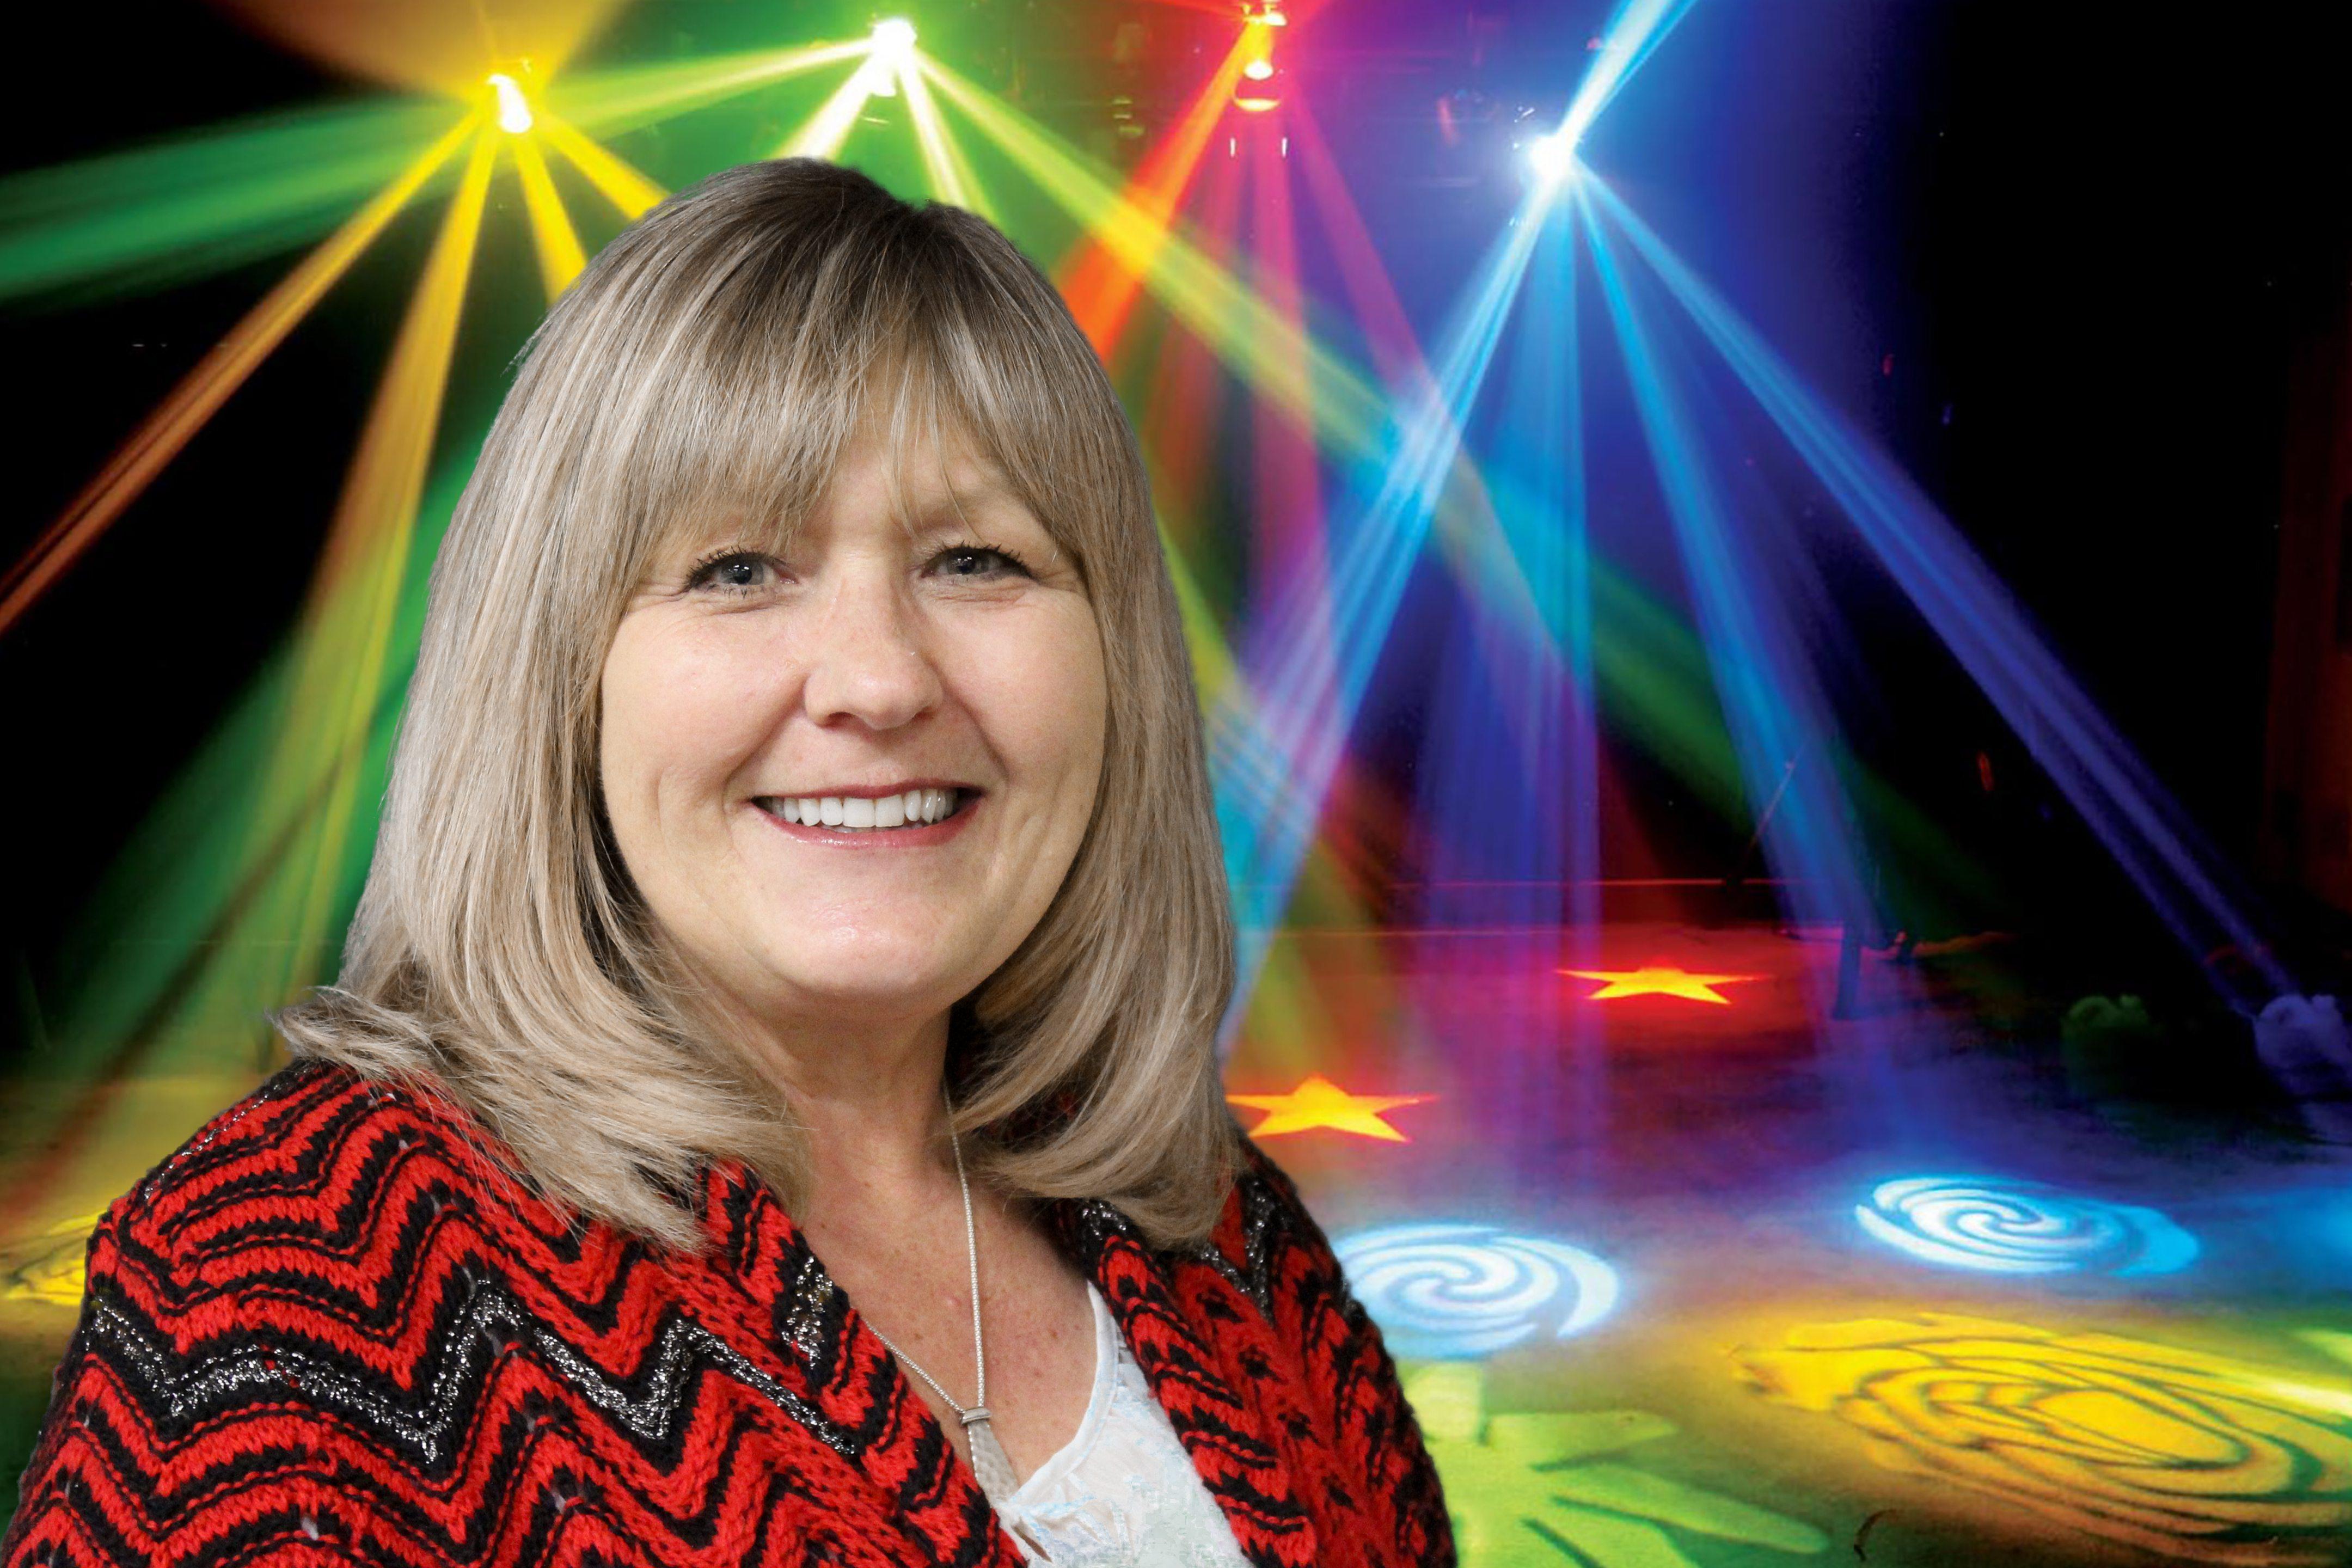 Ronda Andersen - Kearney's Dancing with the Stars 2